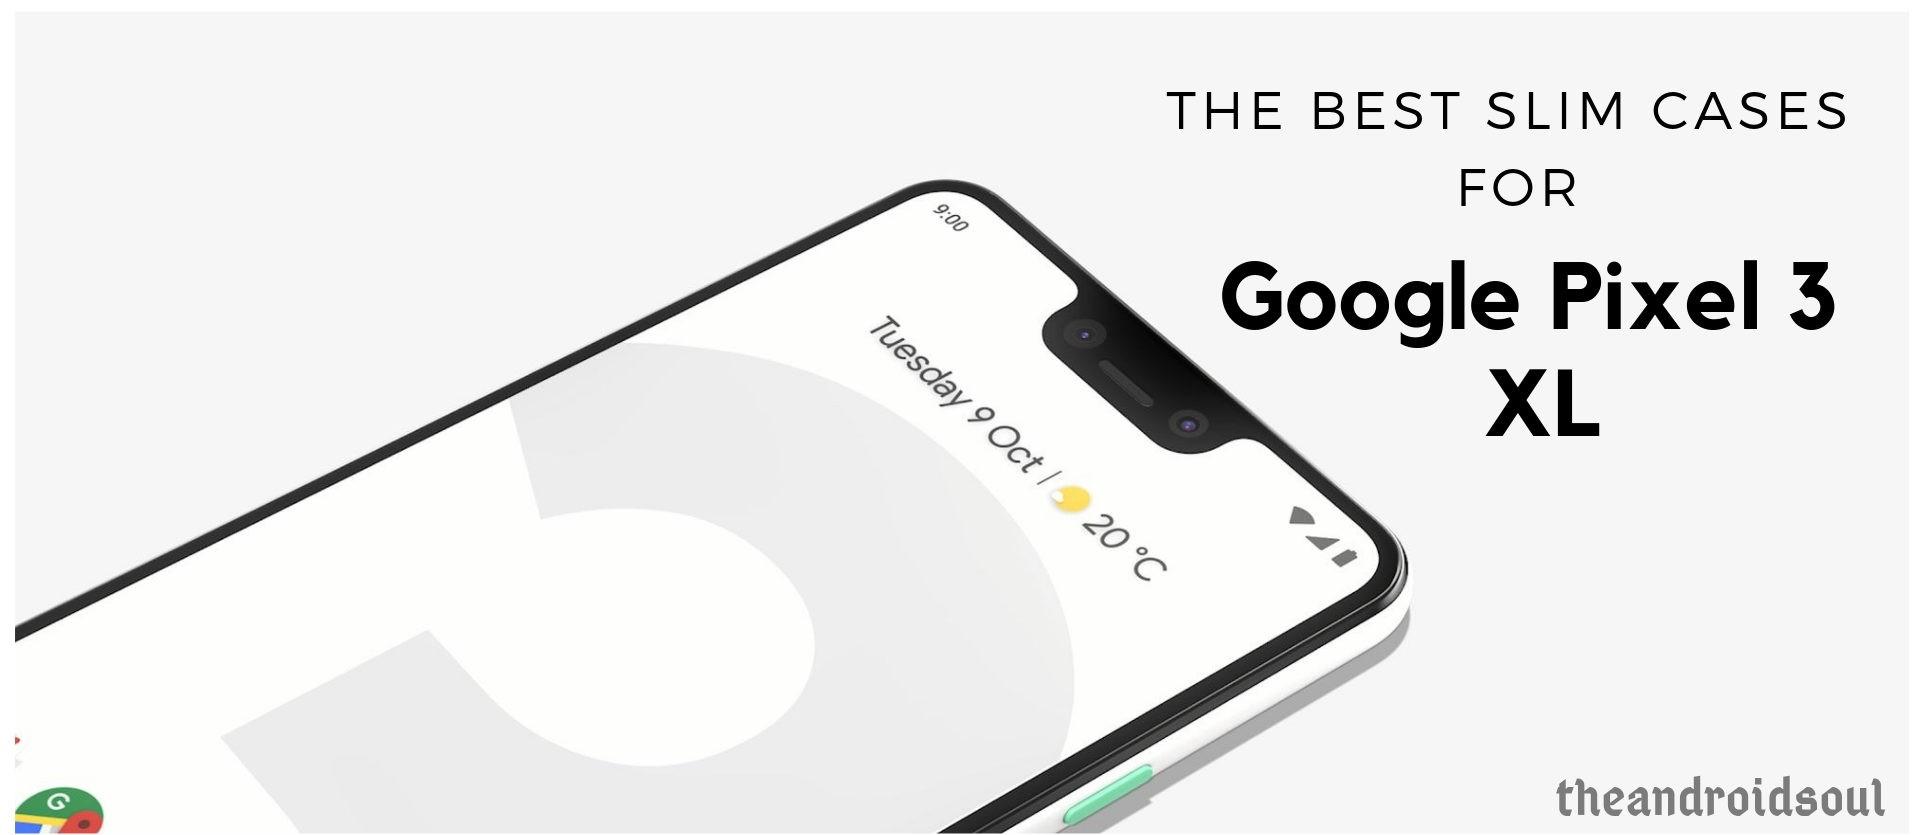 the best slim cases for google pixel 3 xl